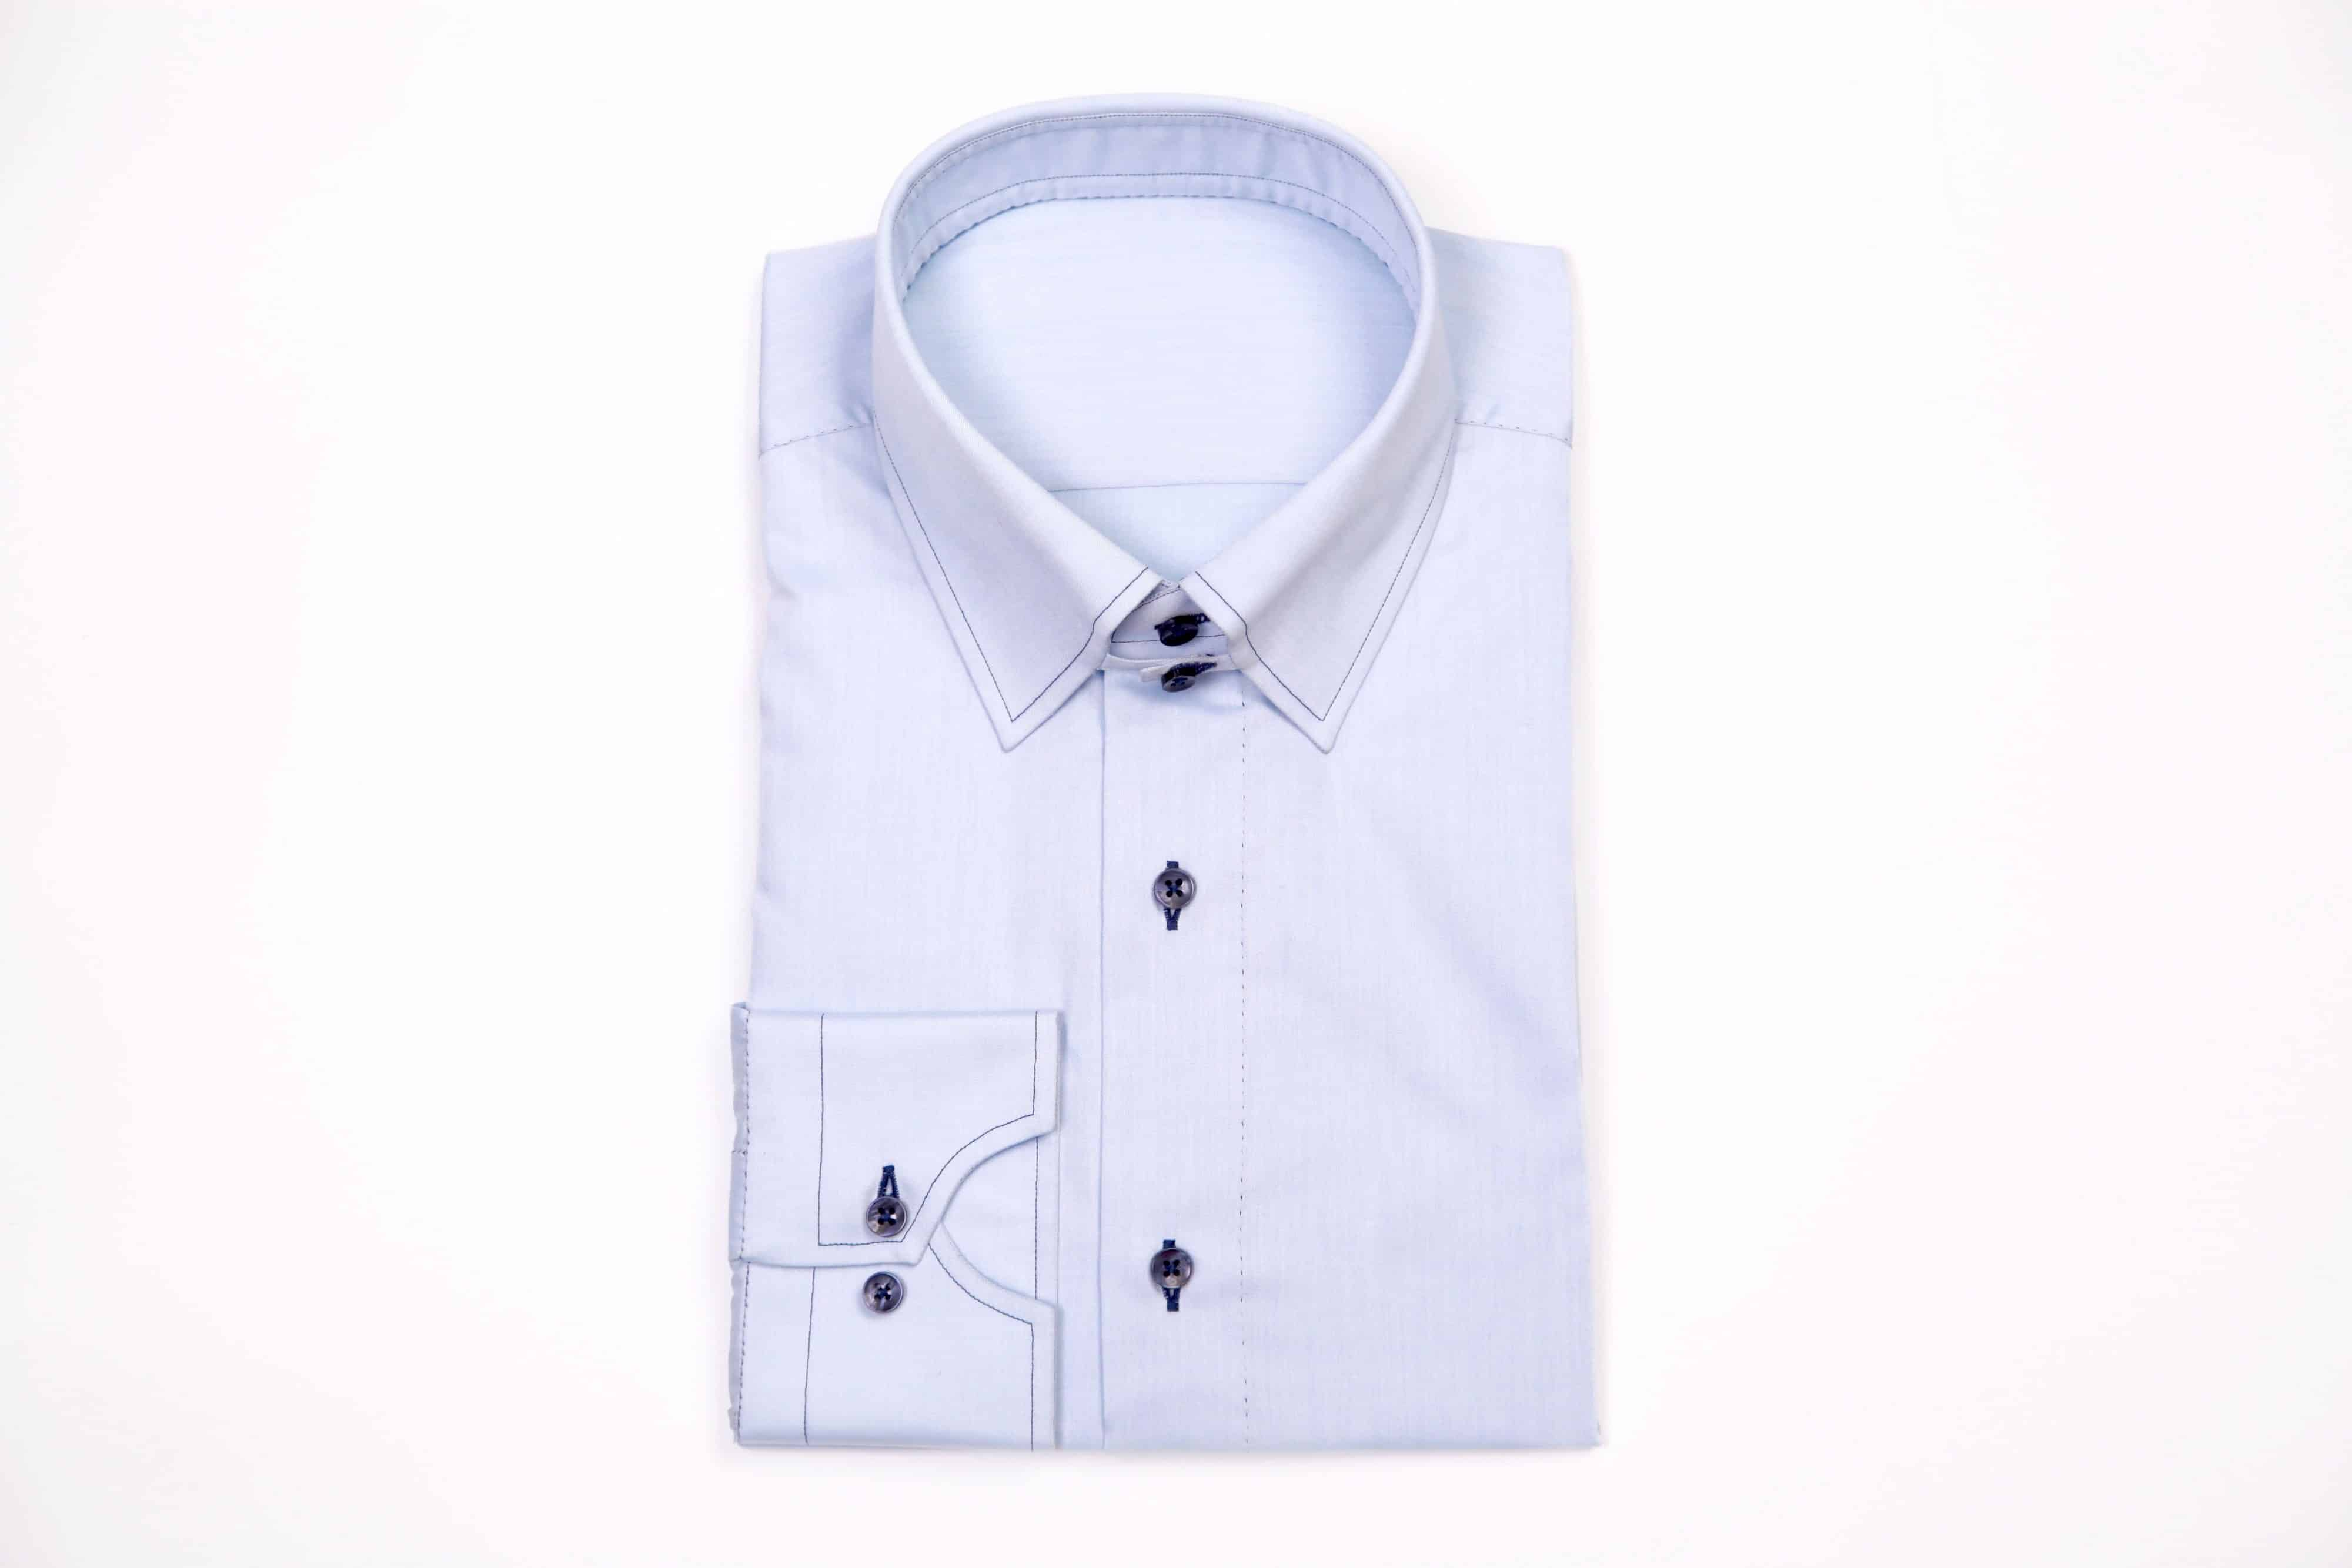 chemise cousue main, chemise fait main, chemise artisanale, atelier chemise, chemise sur mesure, chemise sur mesure luxe, chemise luxe, chemise homme, chemise, chemises, chemise bleue, chemise col anglais, clotilde ranno